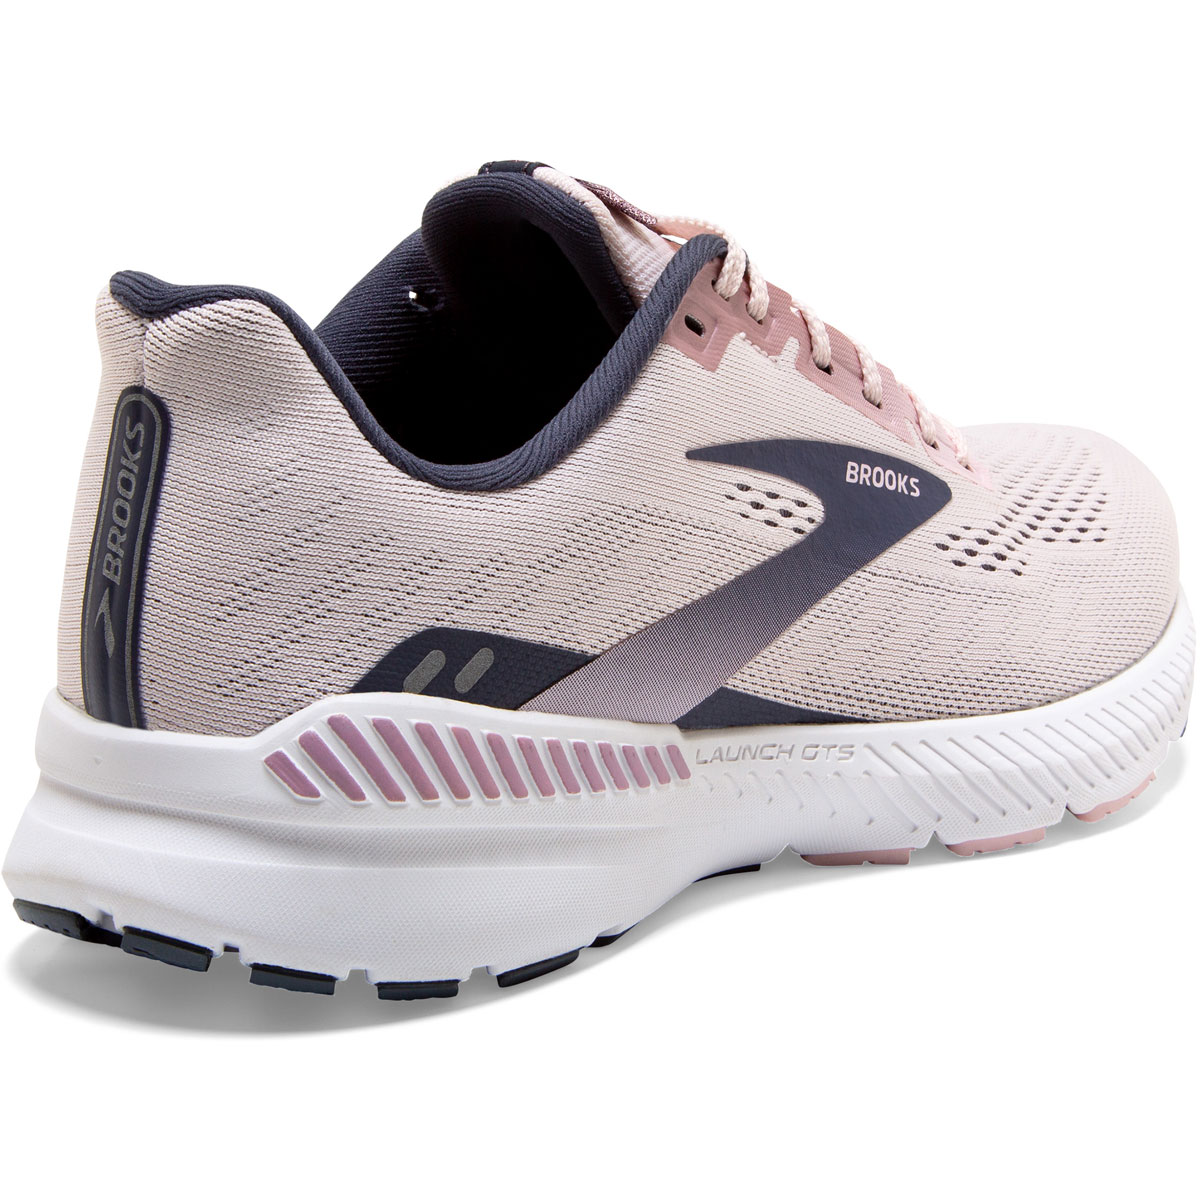 Women's Brooks Launch GTS 8 Running Shoe - Color: Primrose/Ombre - Size: 5 - Width: Regular, Primrose/Ombre, large, image 5